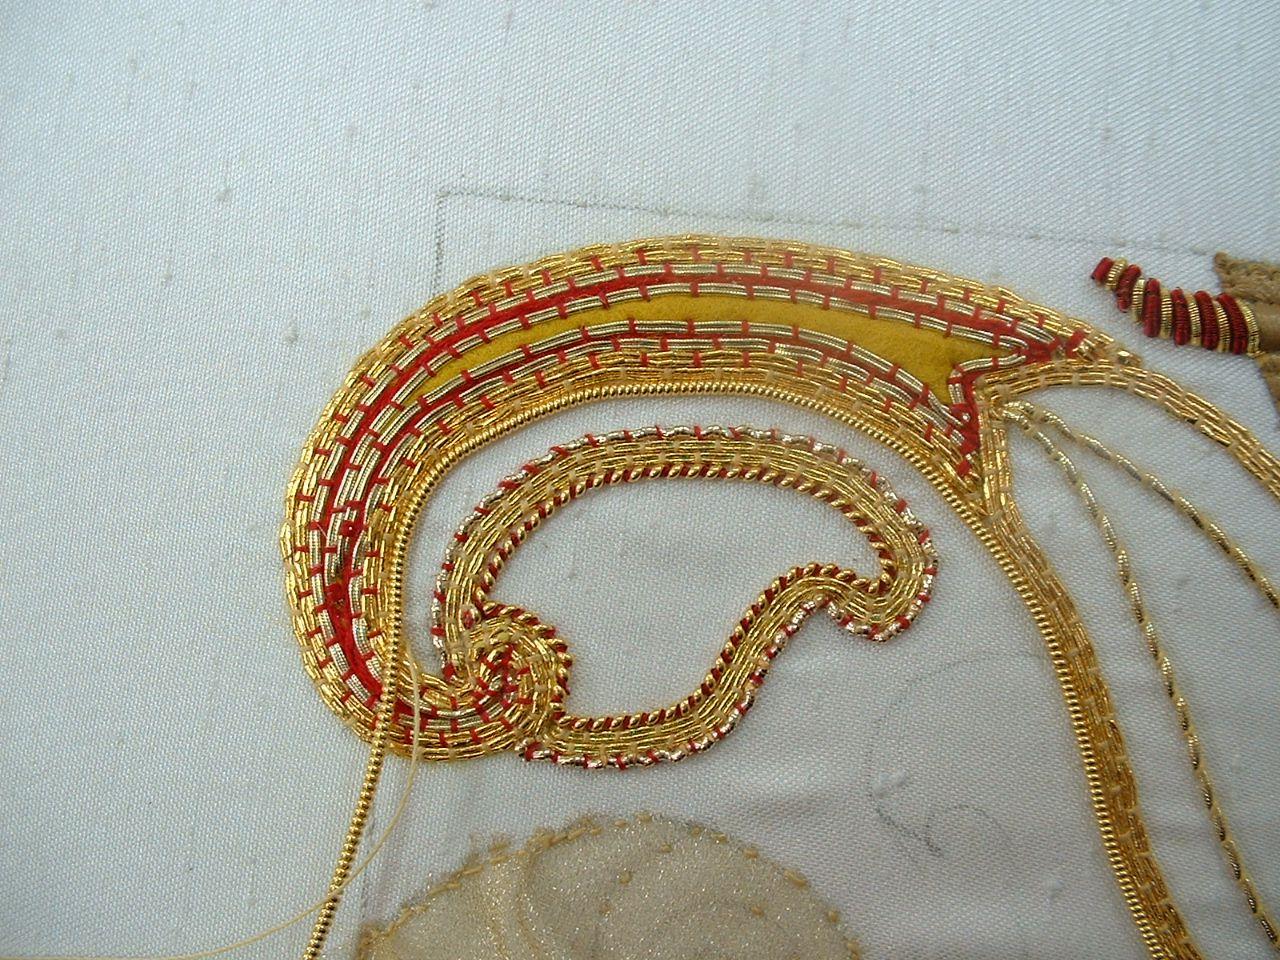 Goldstickerei on pinterest gold embroidery